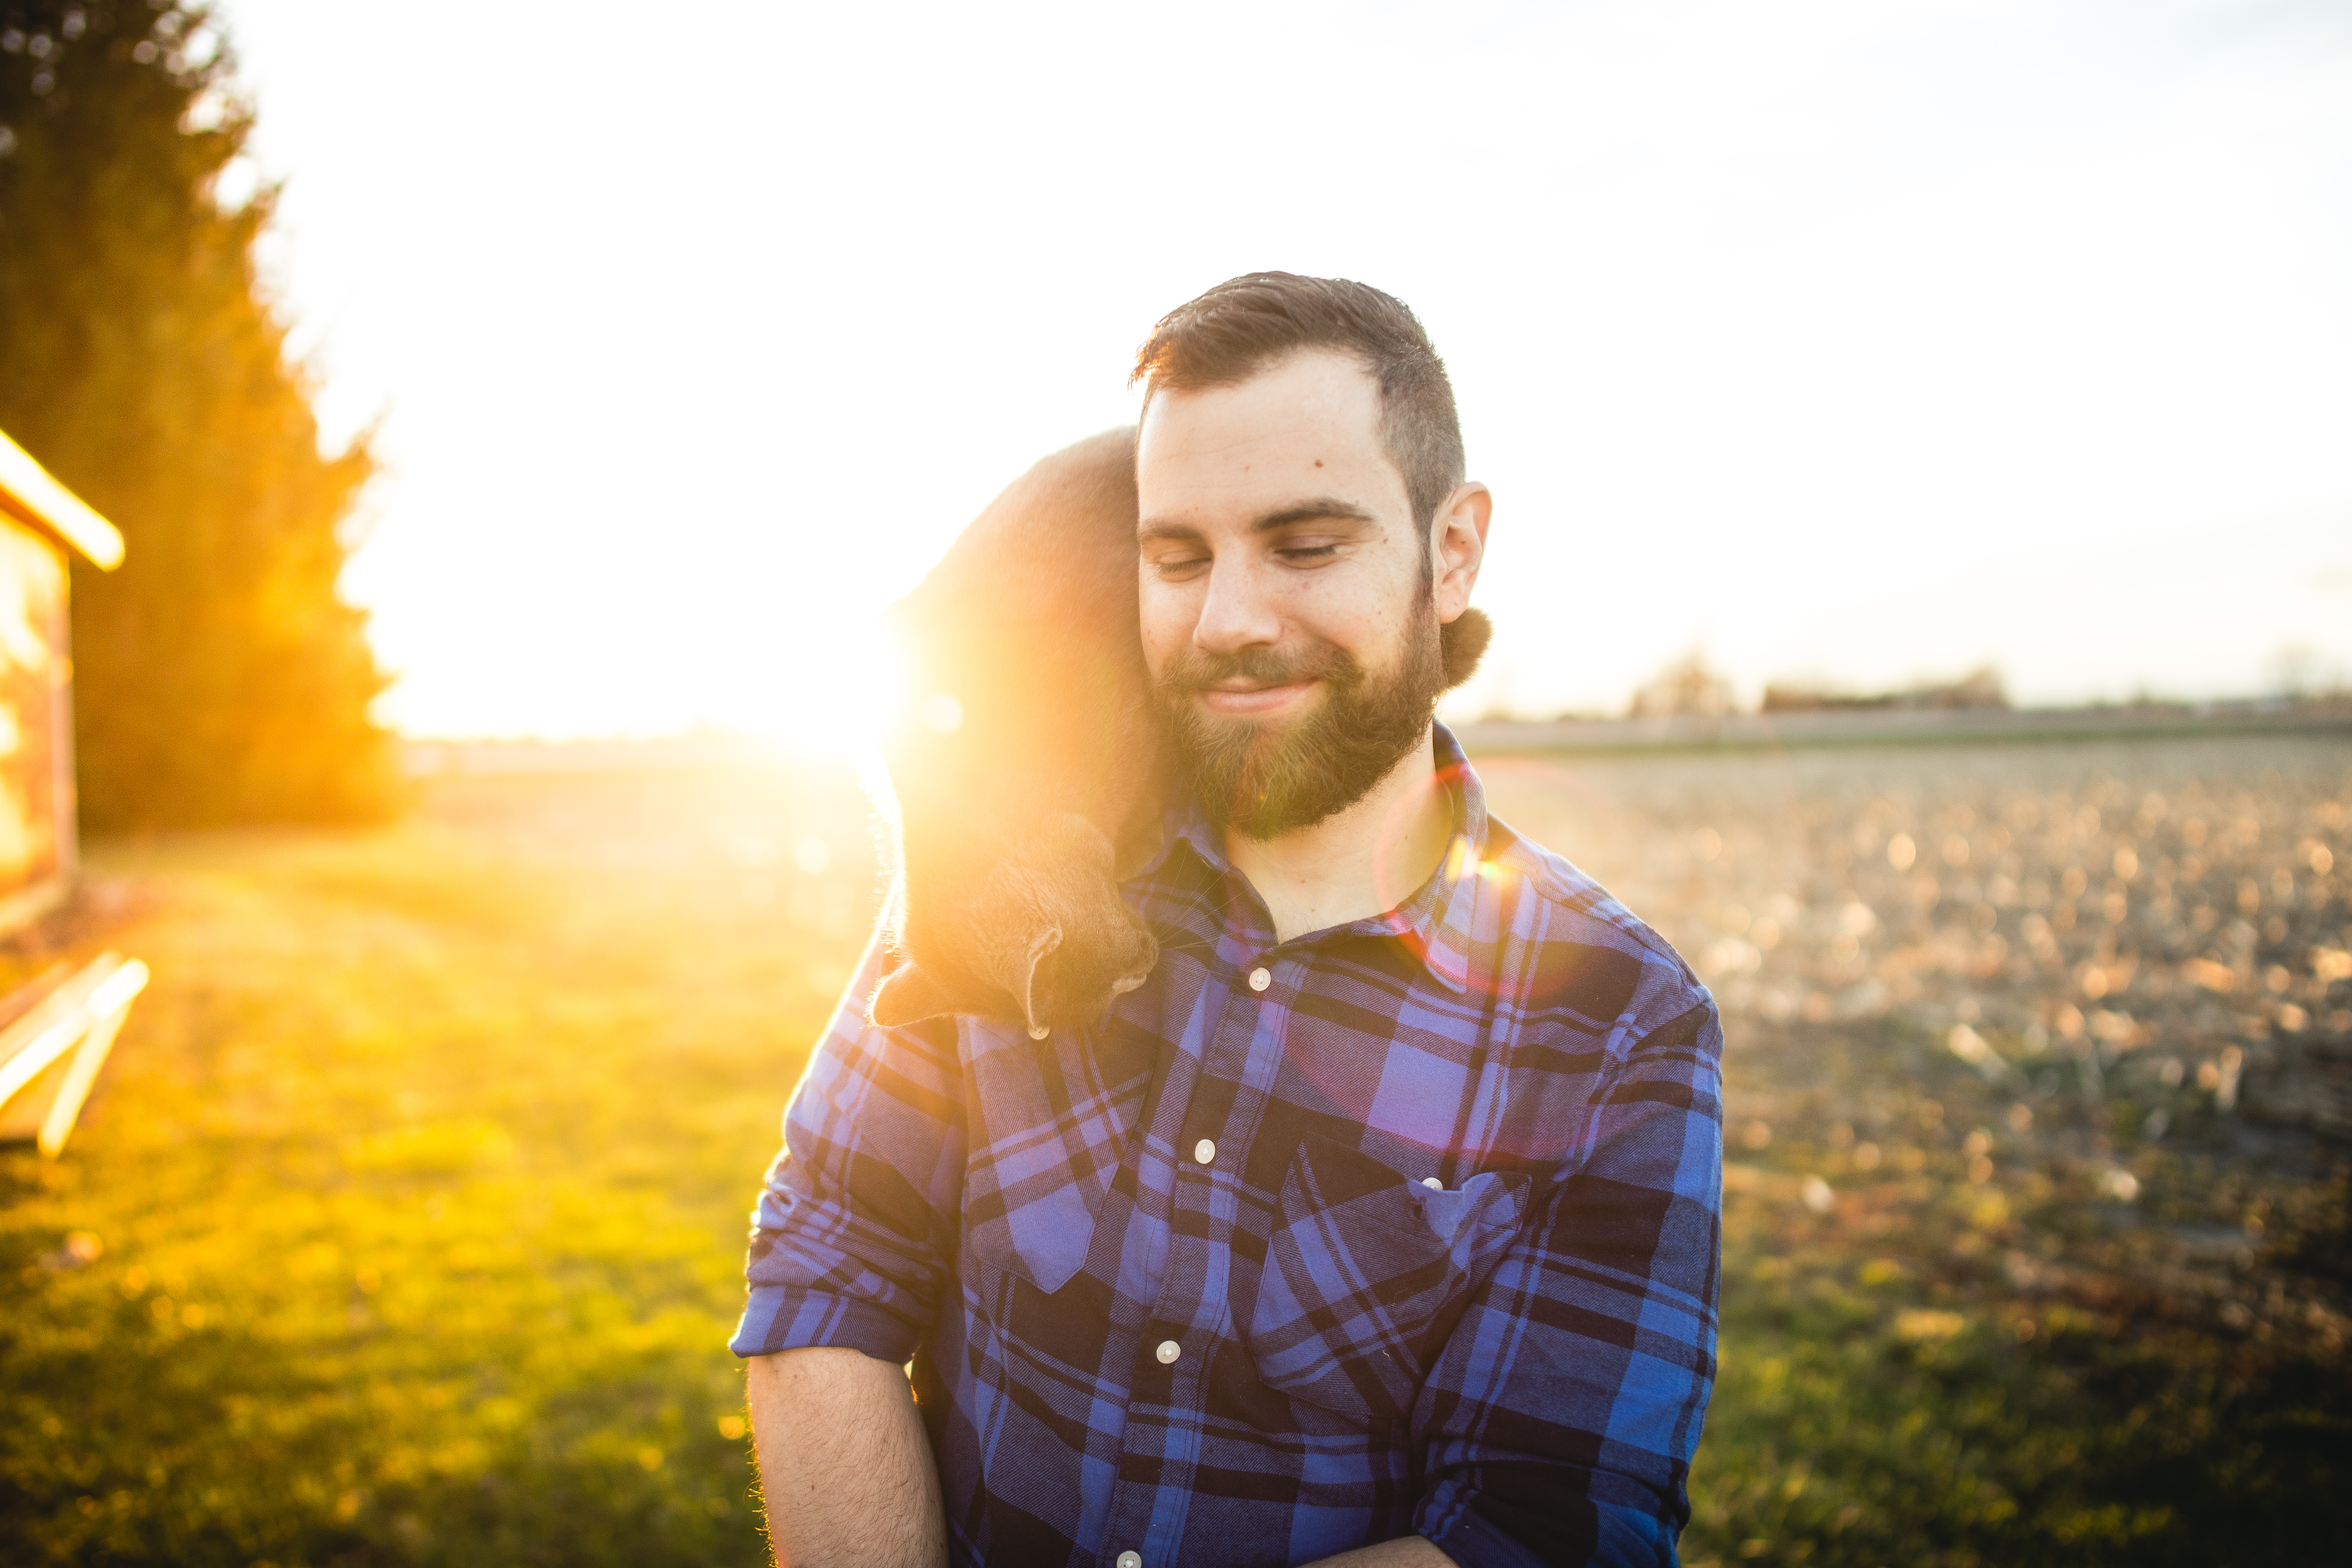 Male dating profile pics